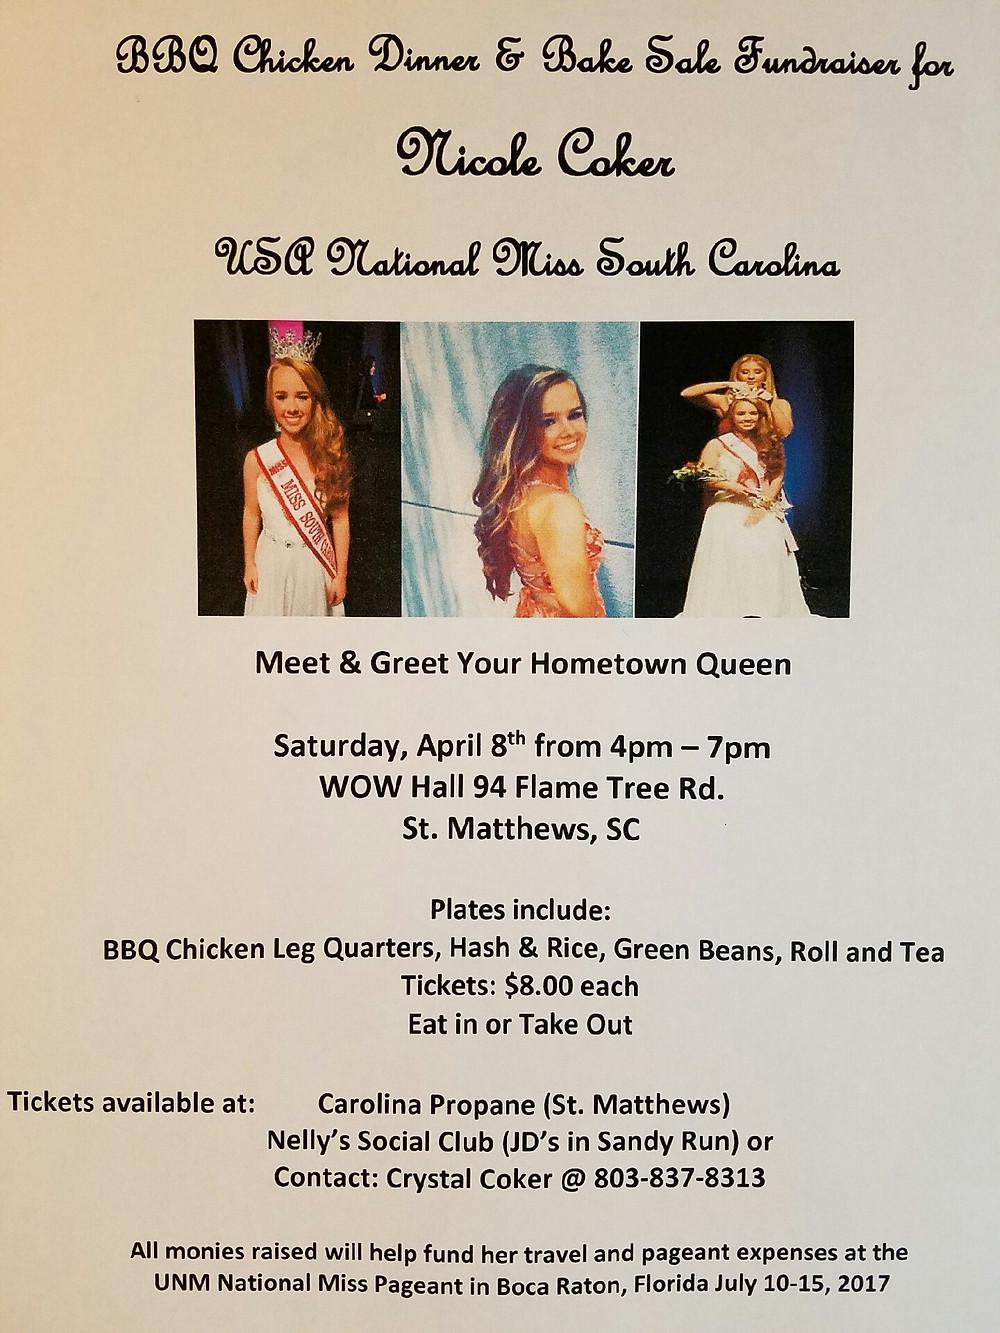 USA National Miss South Carolina, Nicole Coker